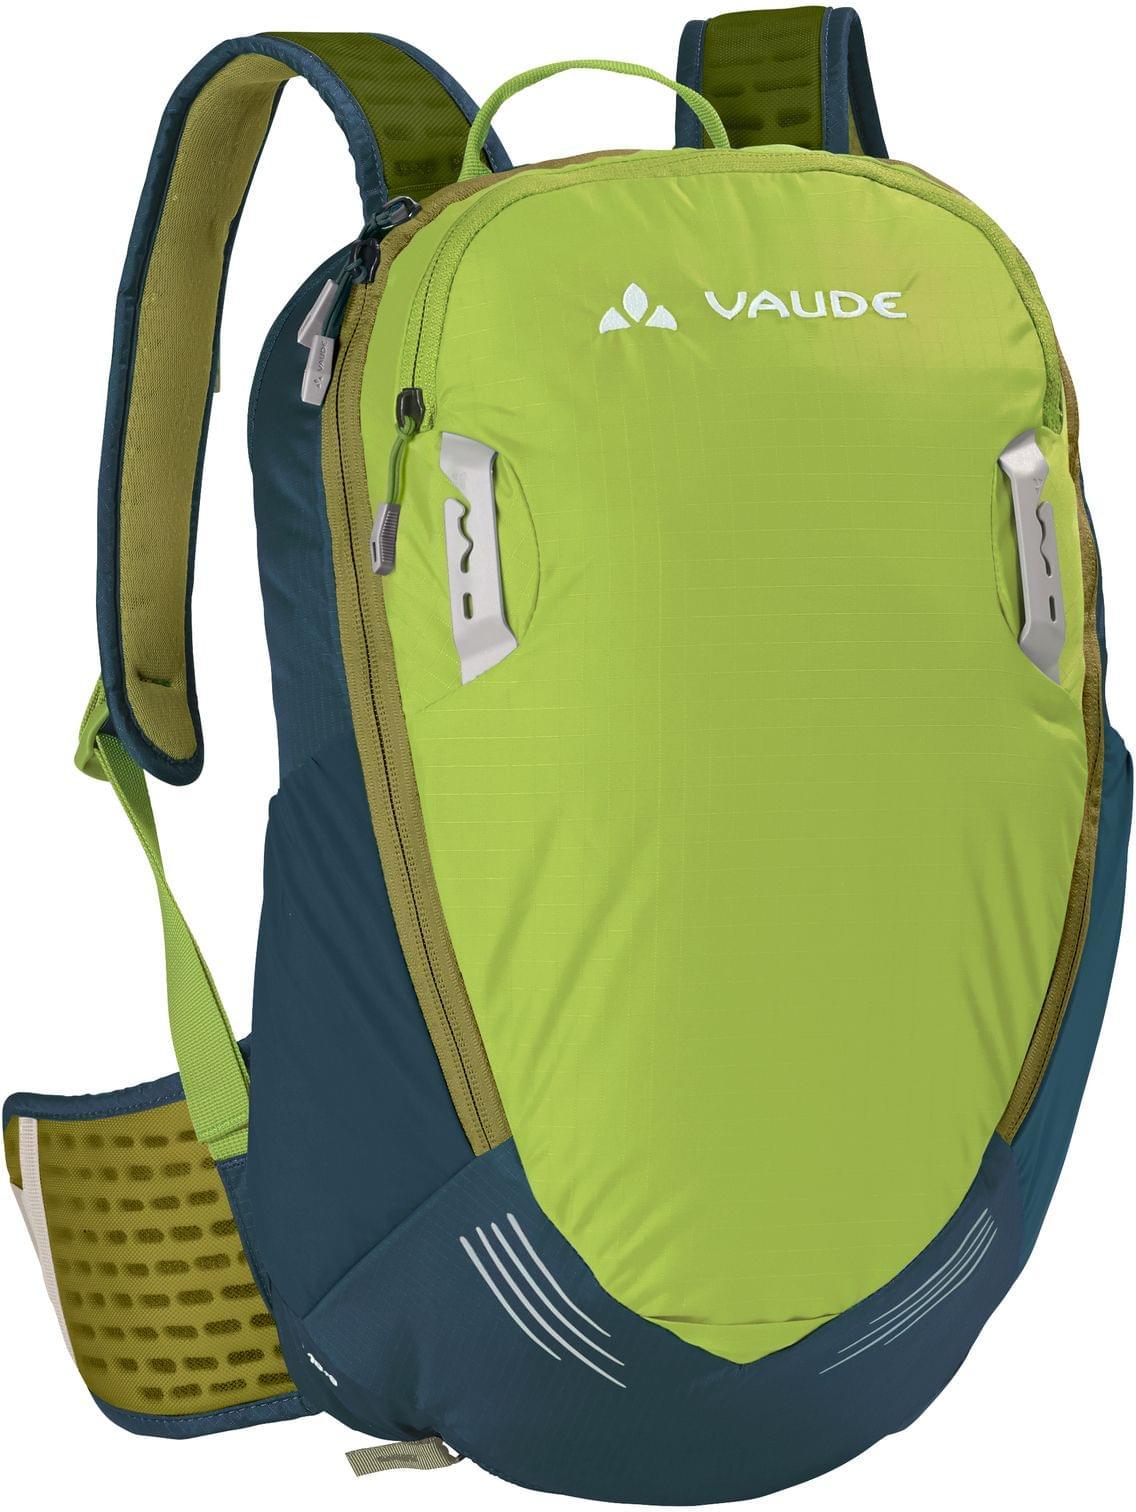 Vaude Cluster 10+3 - chute green uni